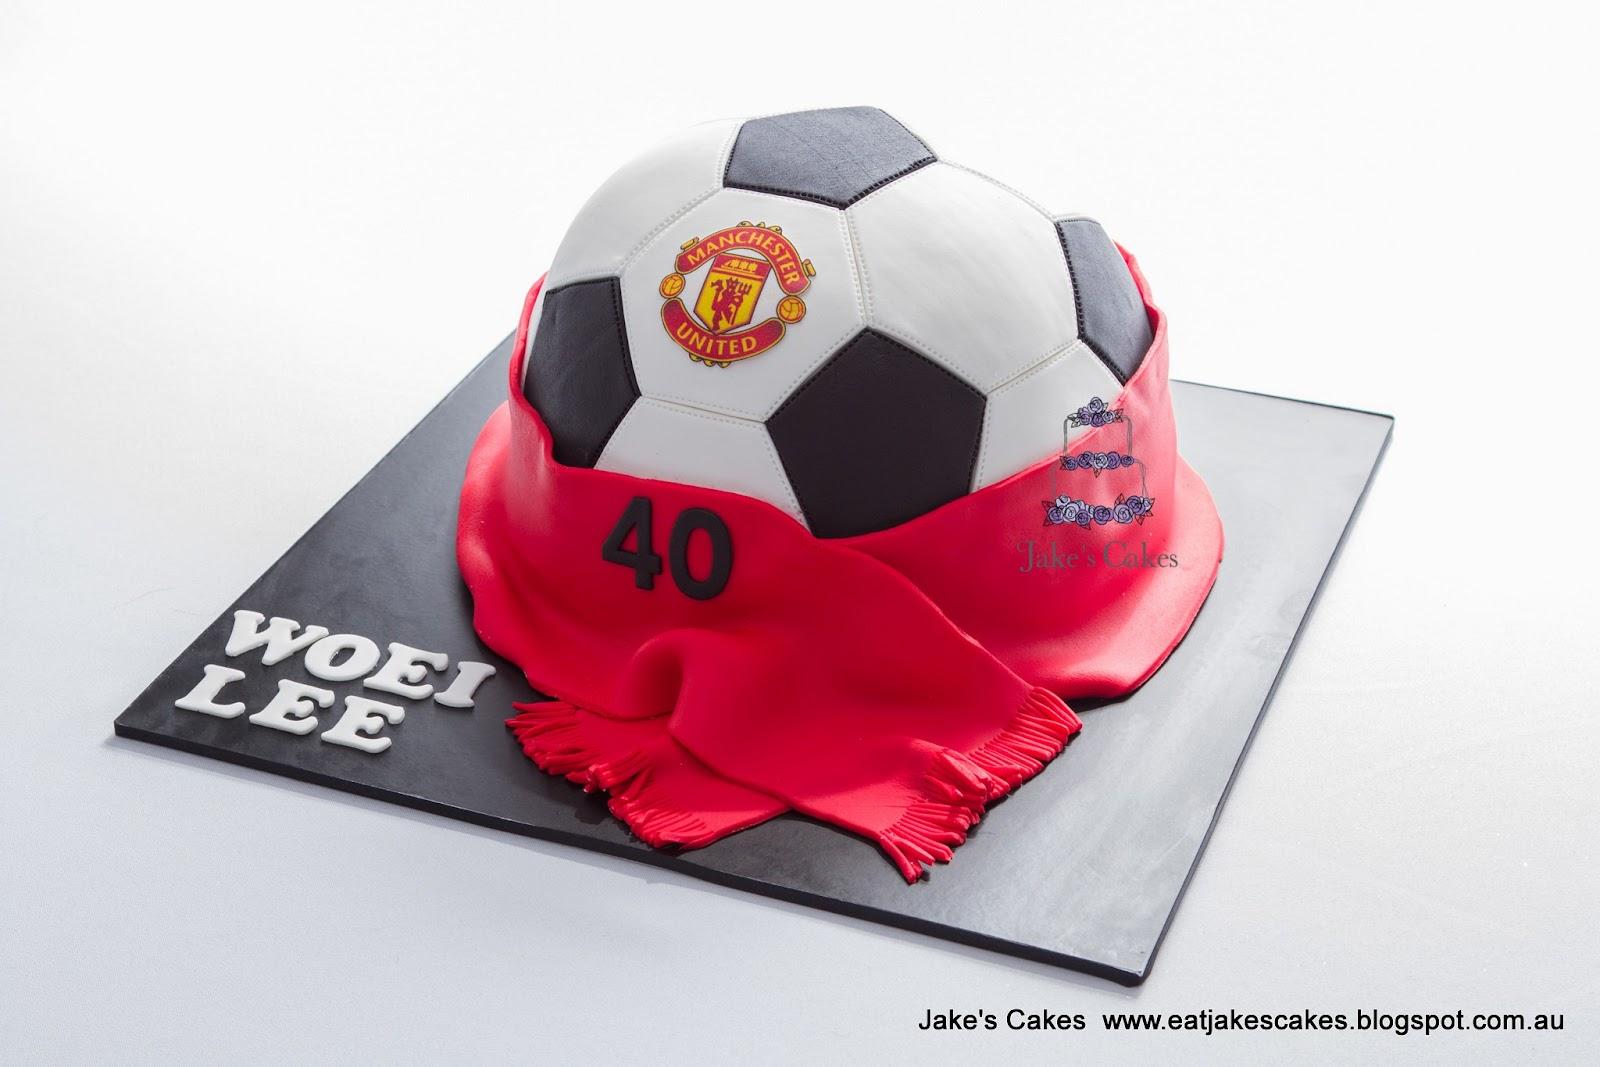 Jakes Cakes Manchester United Soccer Ball Cake